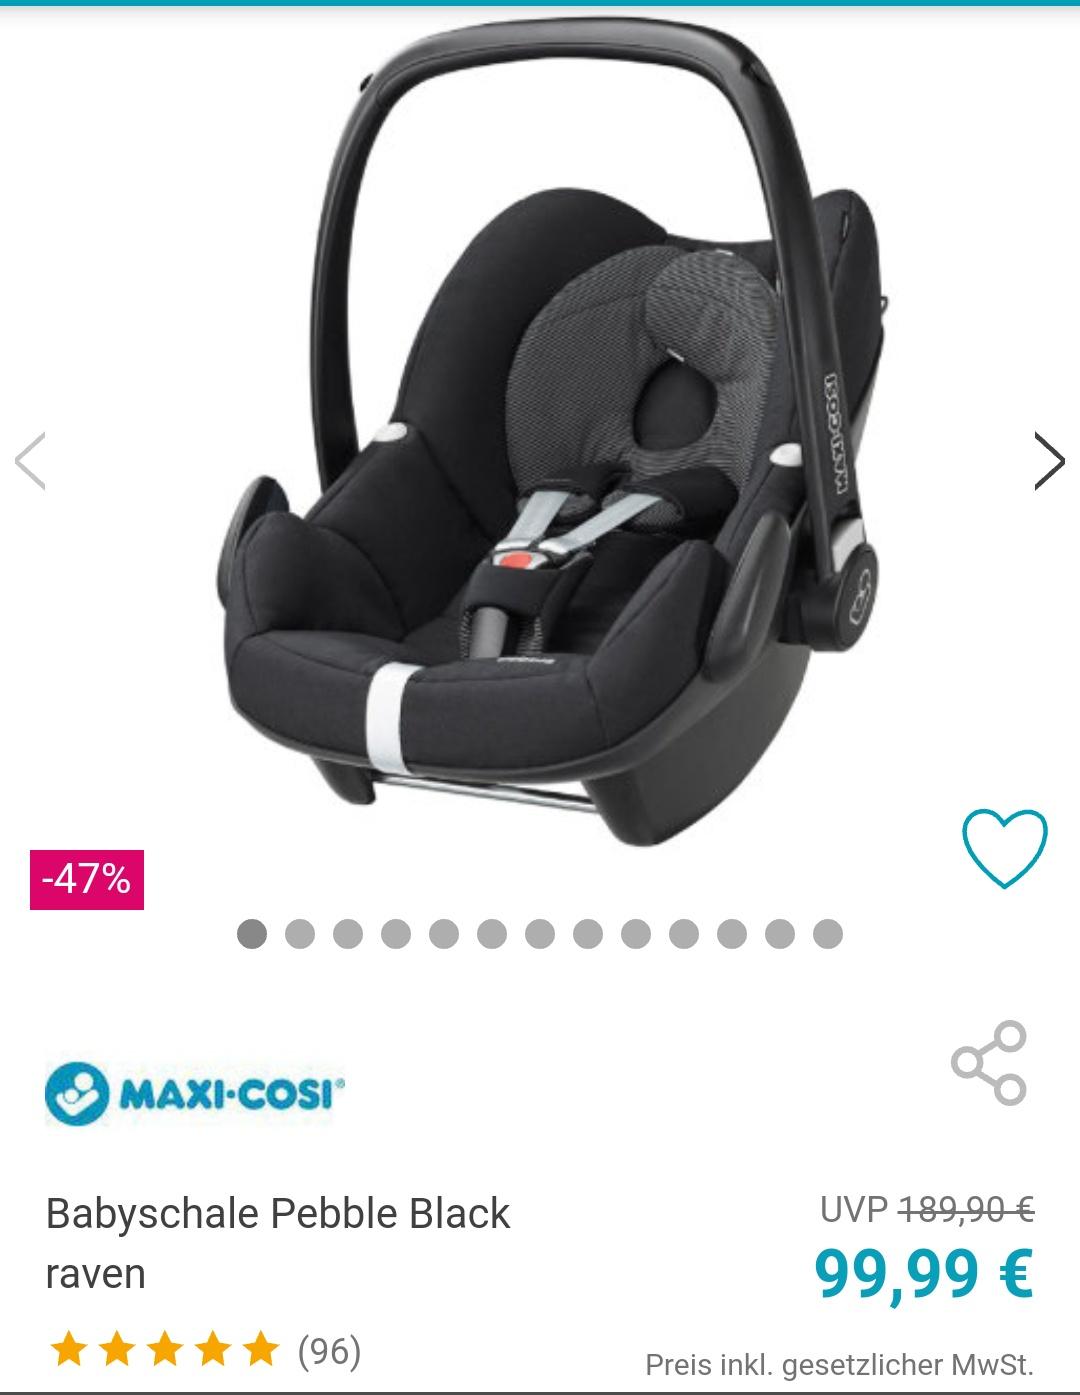 Maxi Cosi Babyschale Pebble Black raven